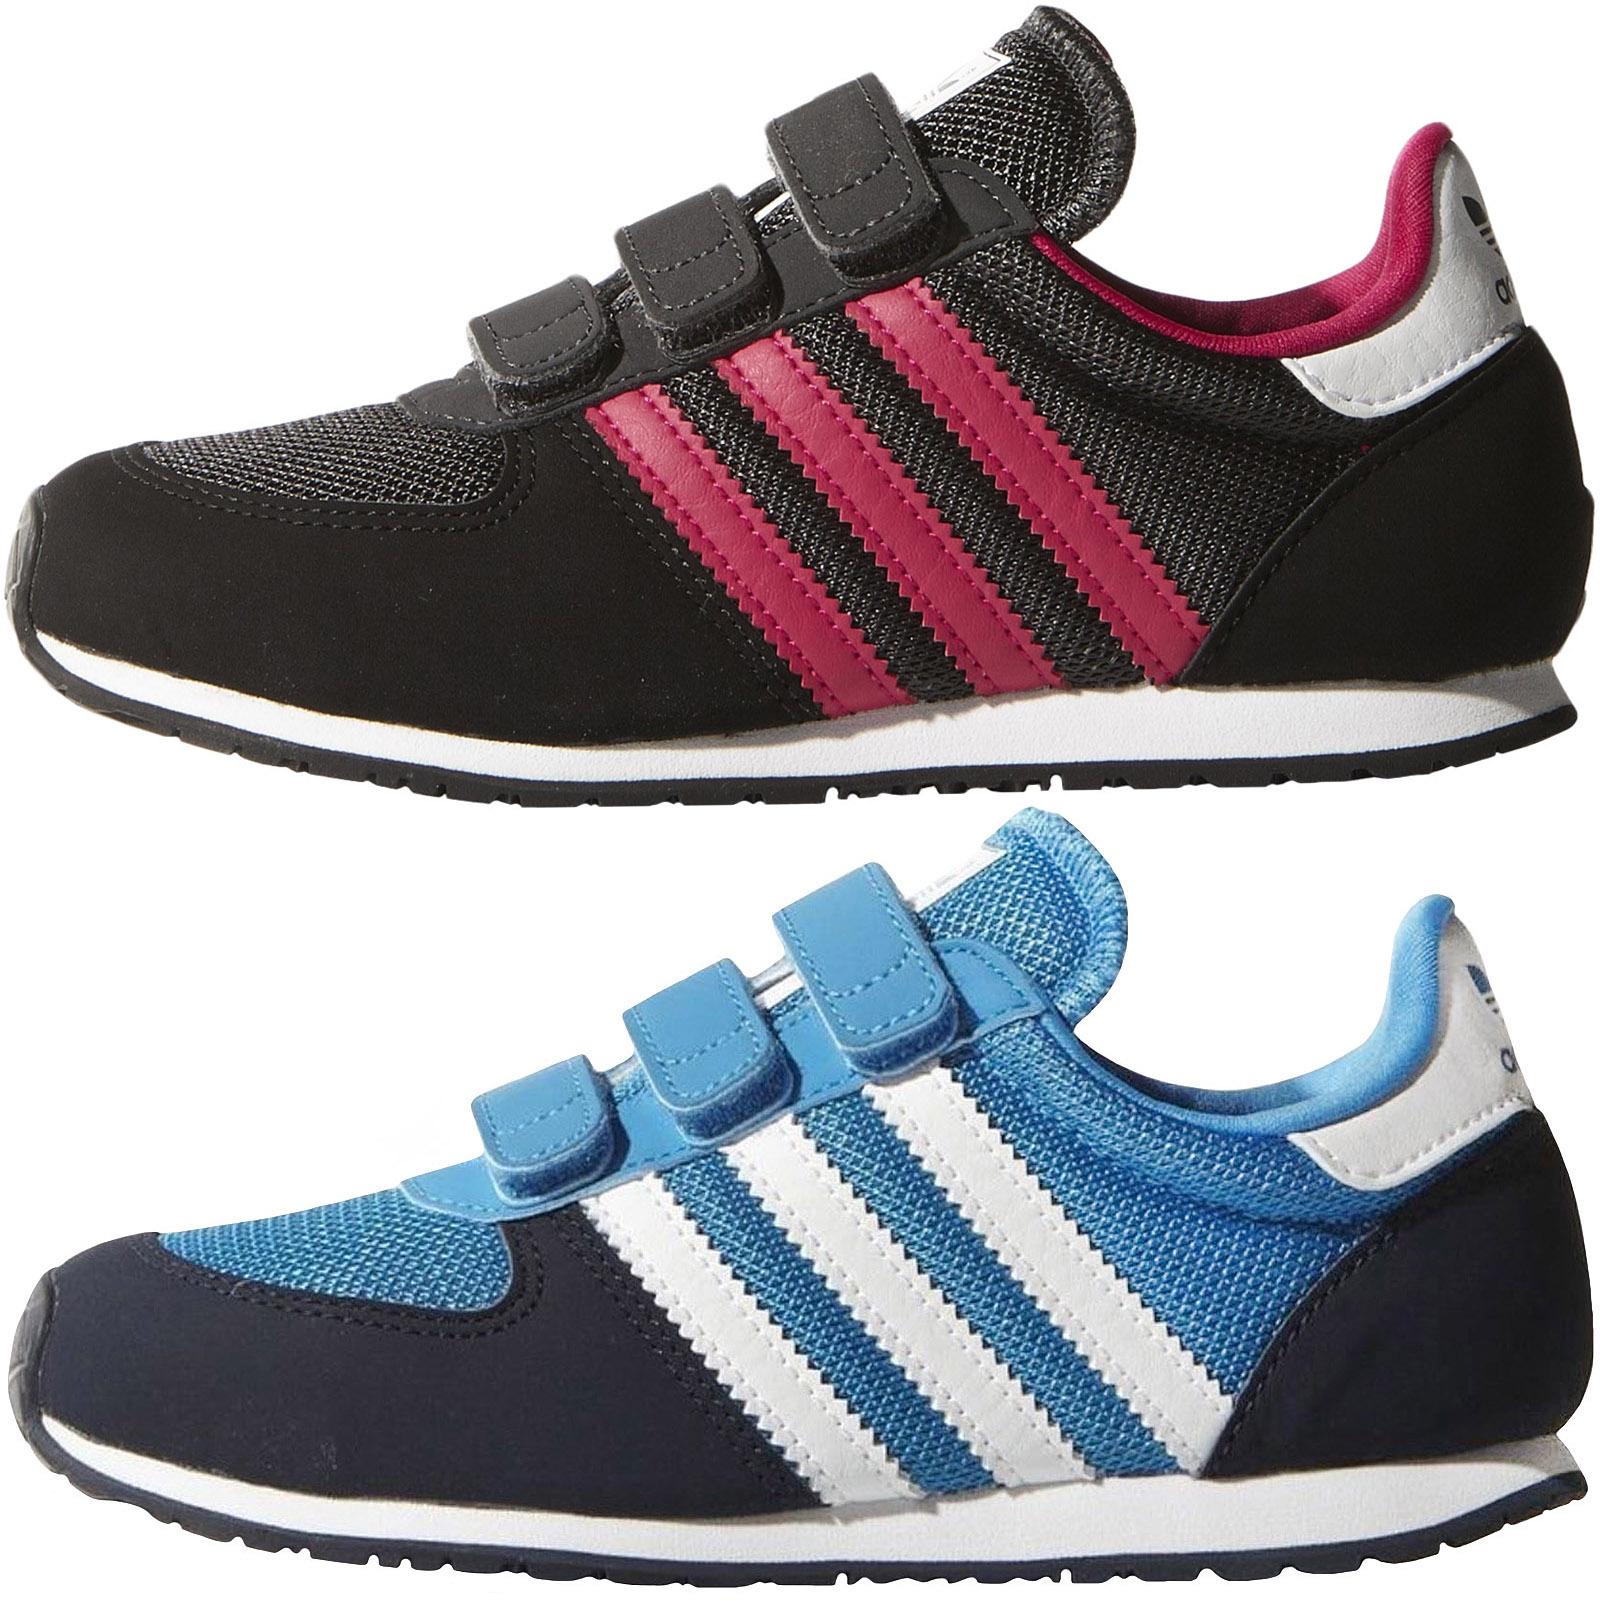 le dernier 4a929 1cdf5 Details about adidas Originals Kids Adistar Racer Fashion Trainers Sneakers